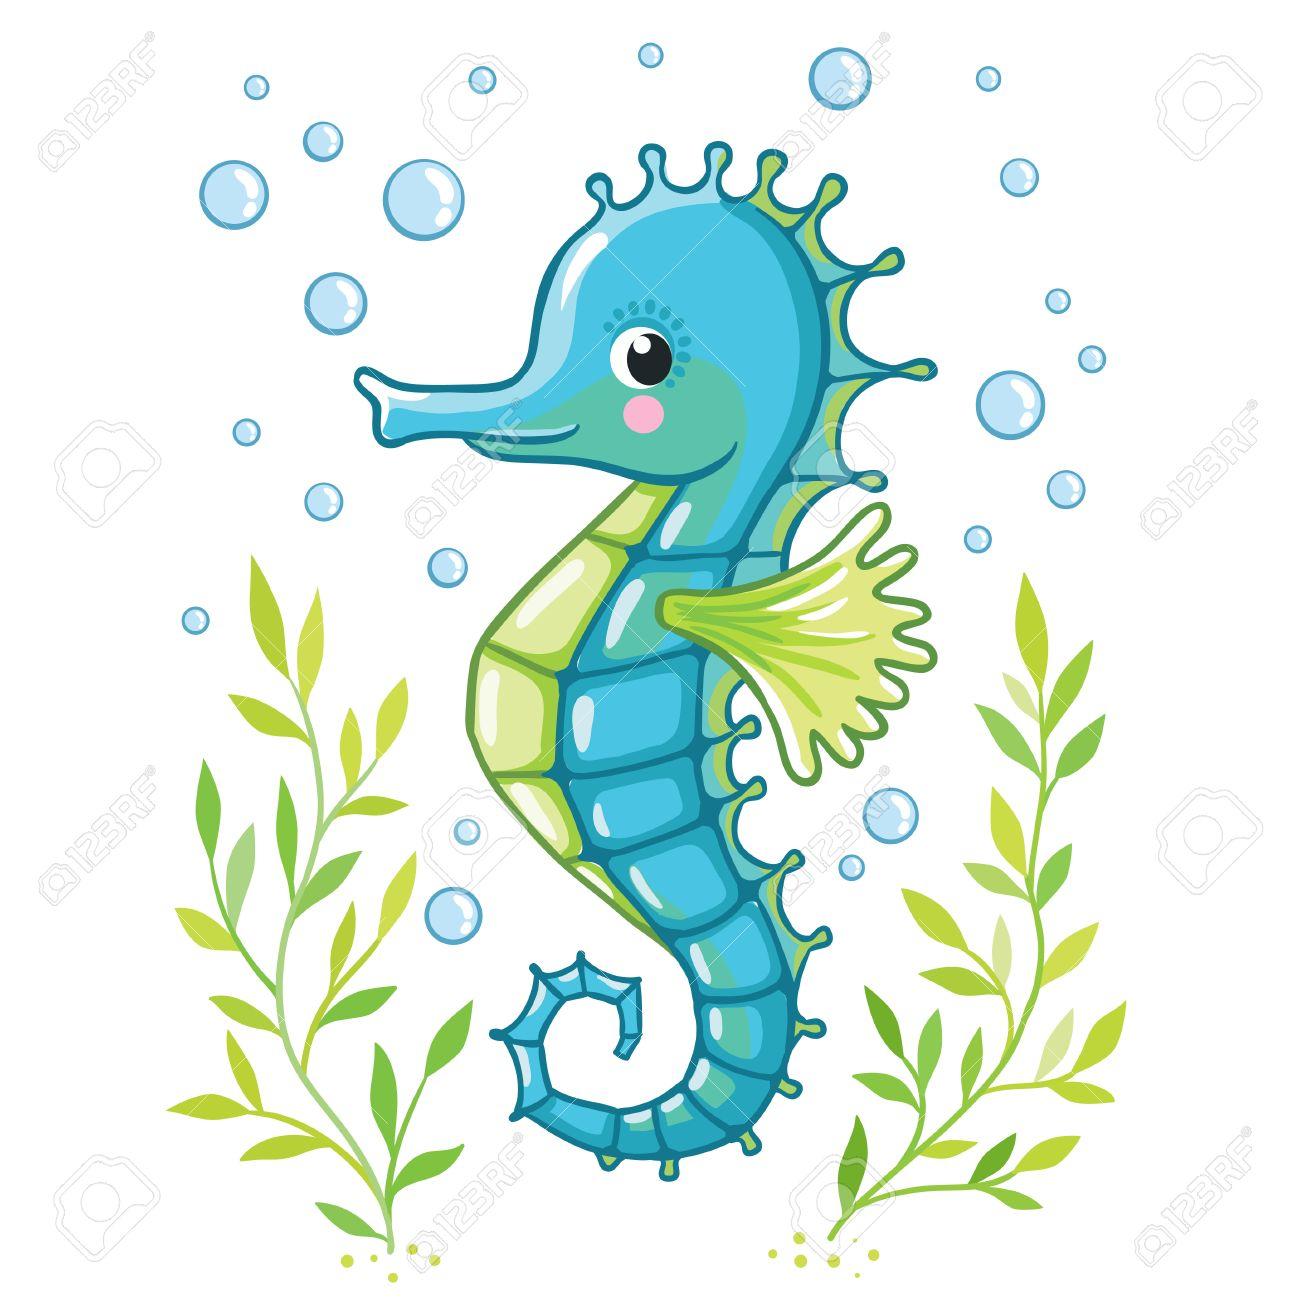 Cartoon seahorse drawing - dinocro.info